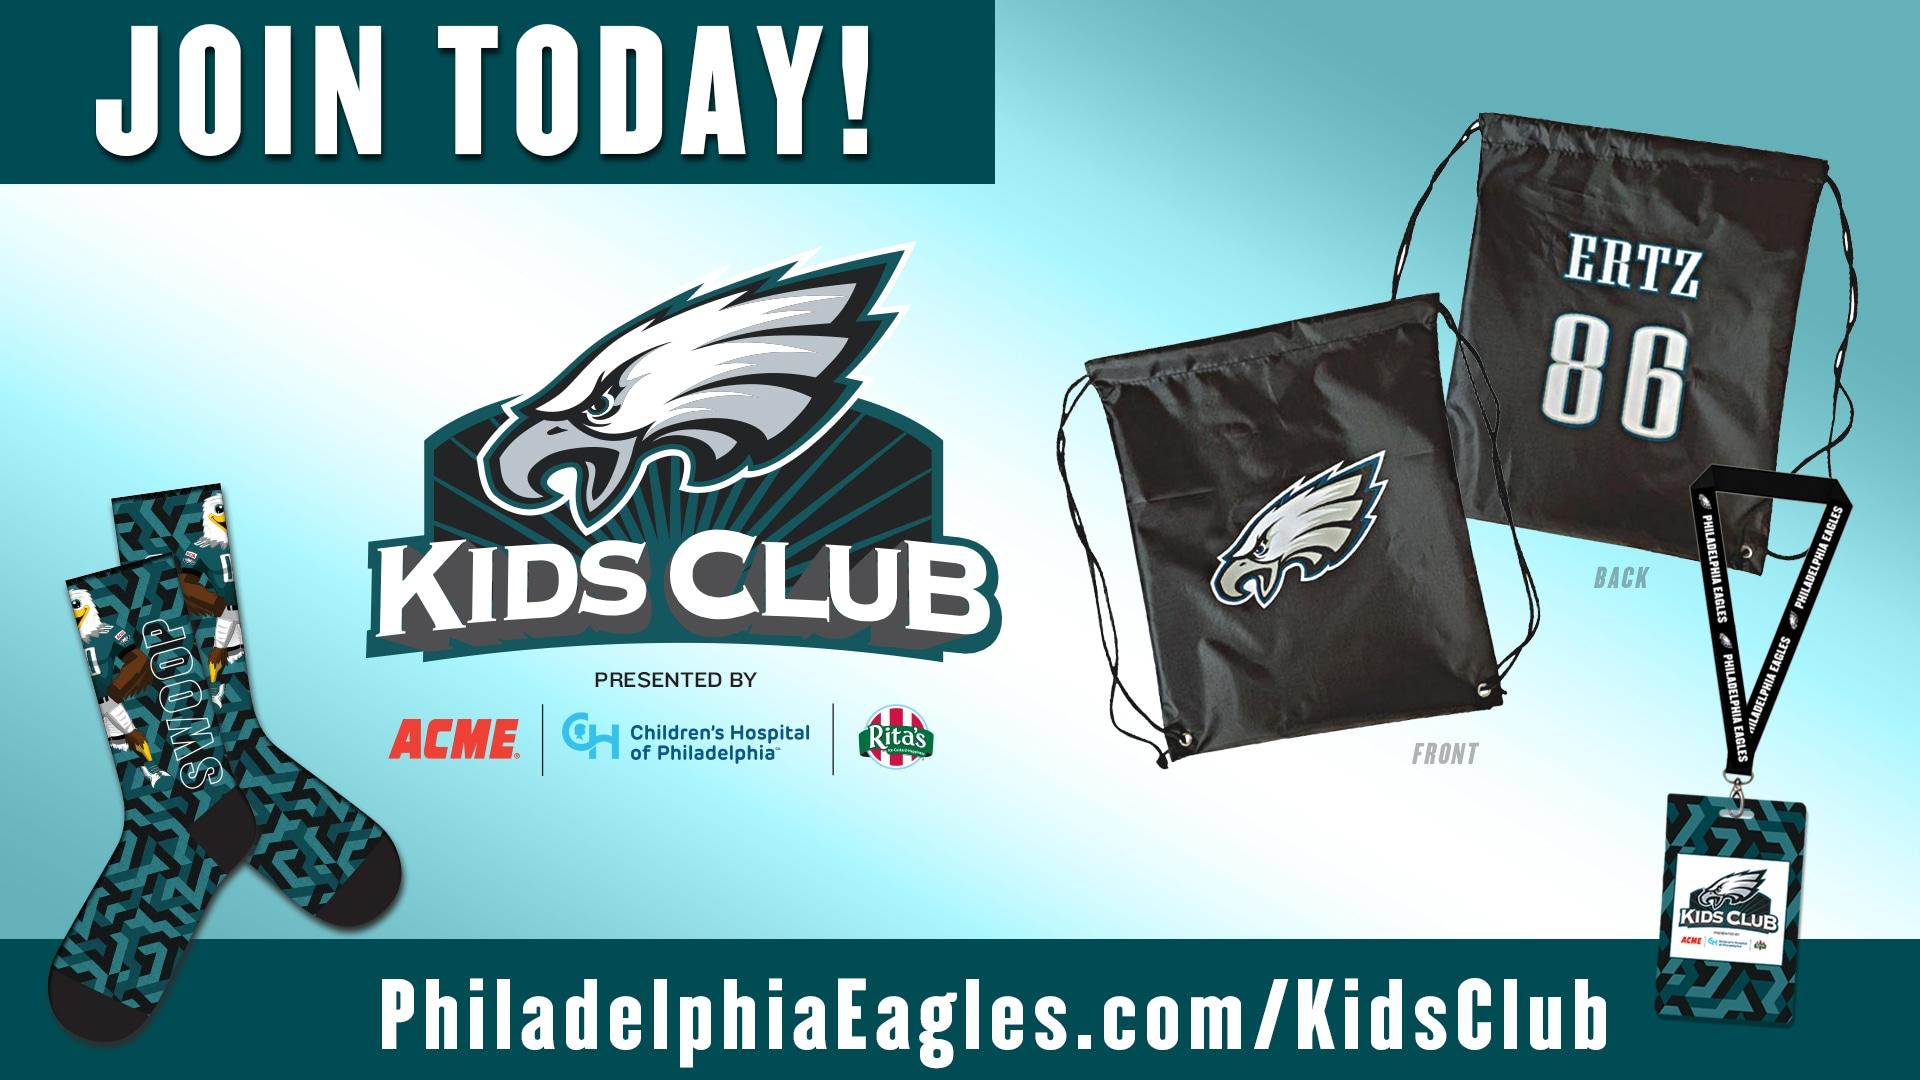 Philadelphia Eagles Kids Club